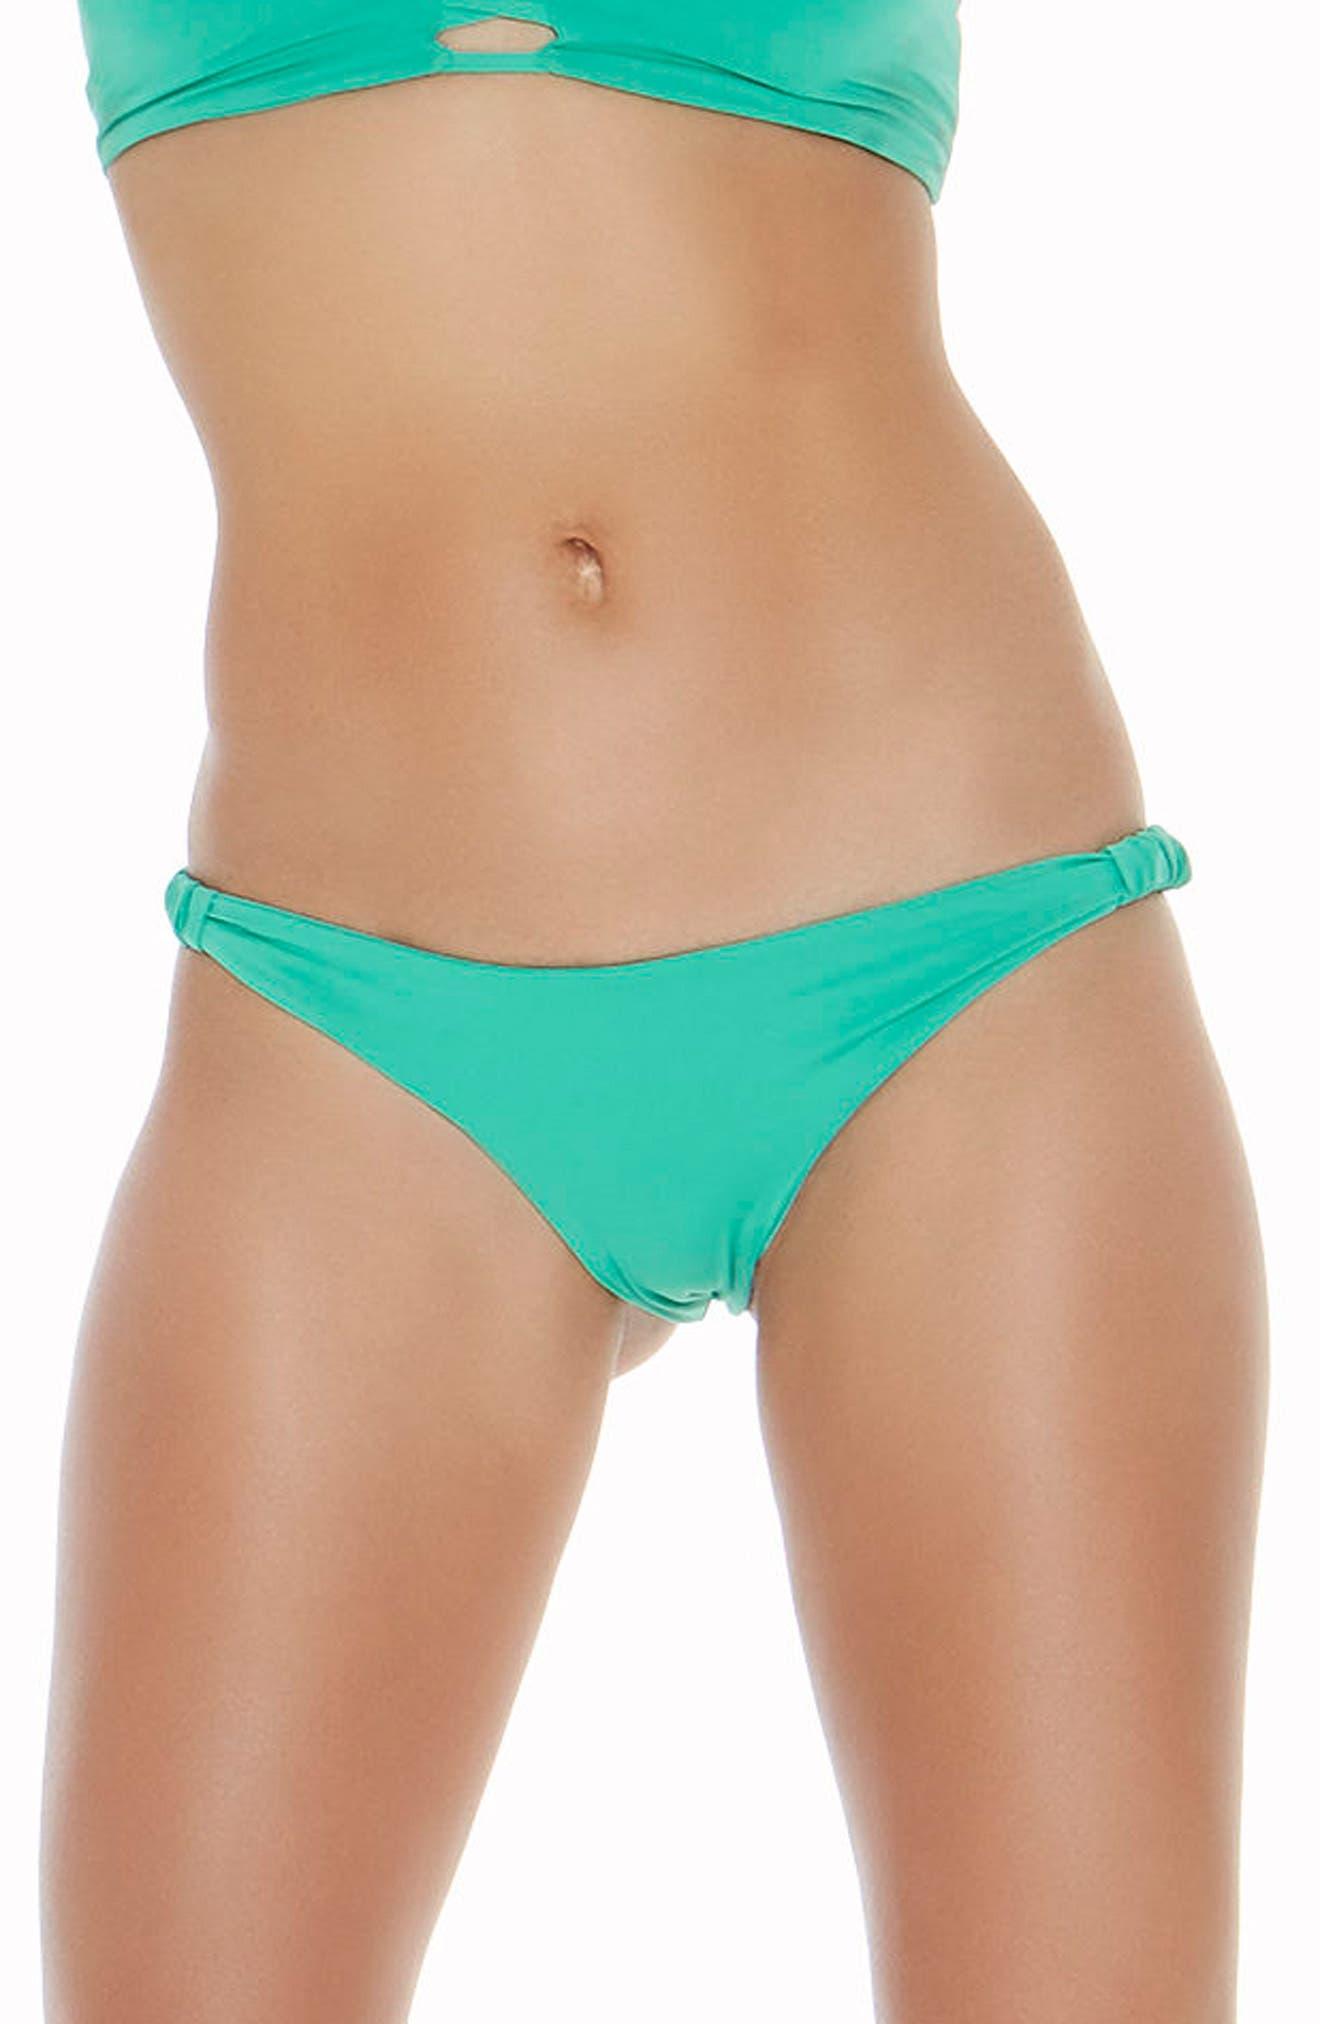 Sundrop Slider Bikini Bottoms,                             Main thumbnail 1, color,                             Spearmint